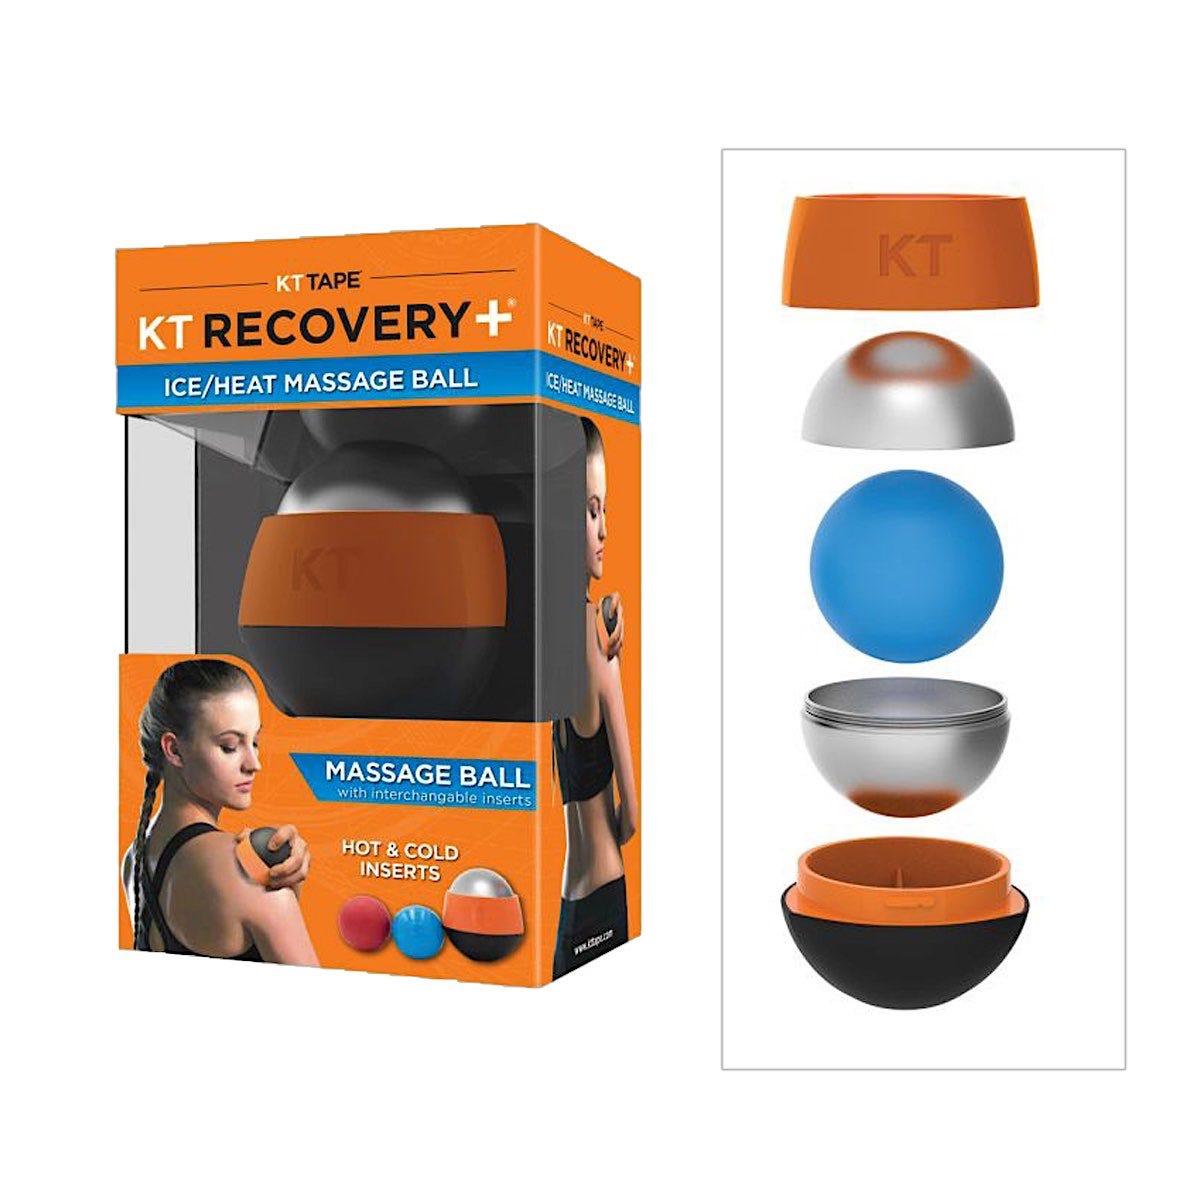 KT Recovery+ Ice/Heat Massage Ball